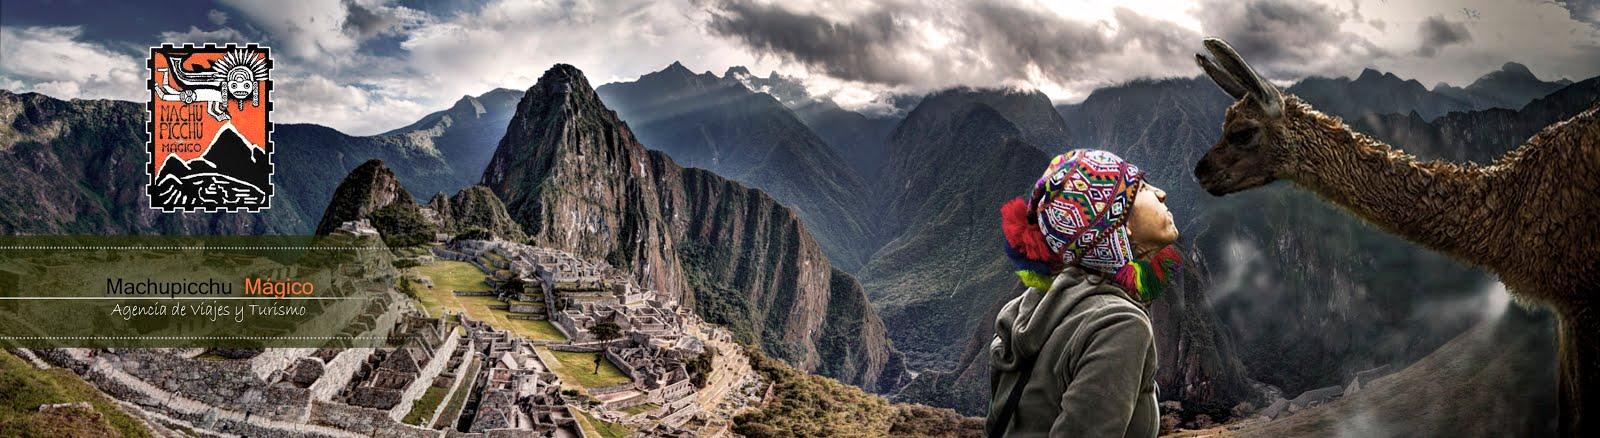 Gastronomia  Peruana  Machupicchu Magico Agencia de Viajes y Turismo